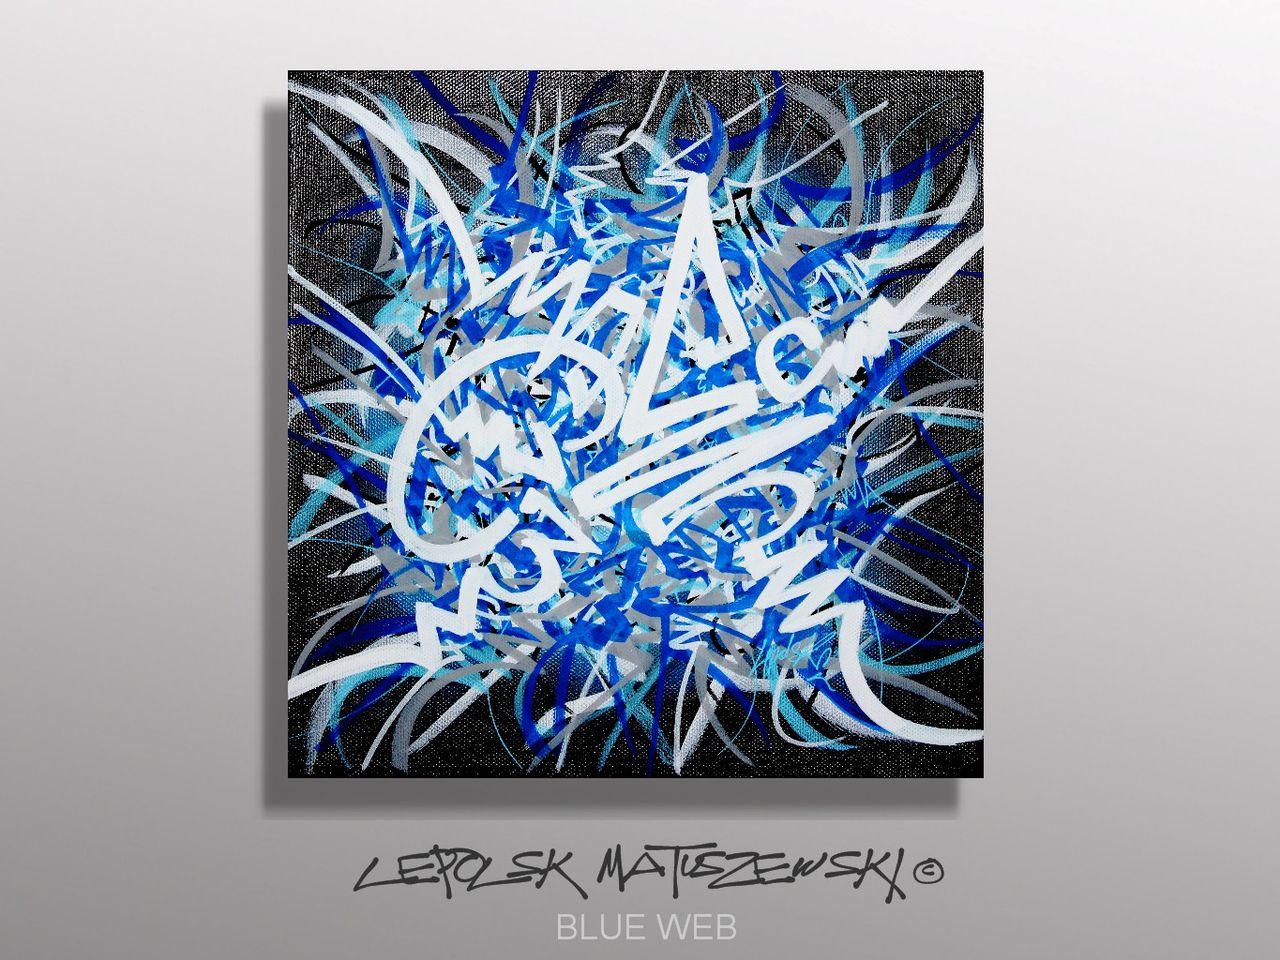 MK  Lepolsk Matuszewski BLUE WEB    street art calligraffiti graffiti abstrait